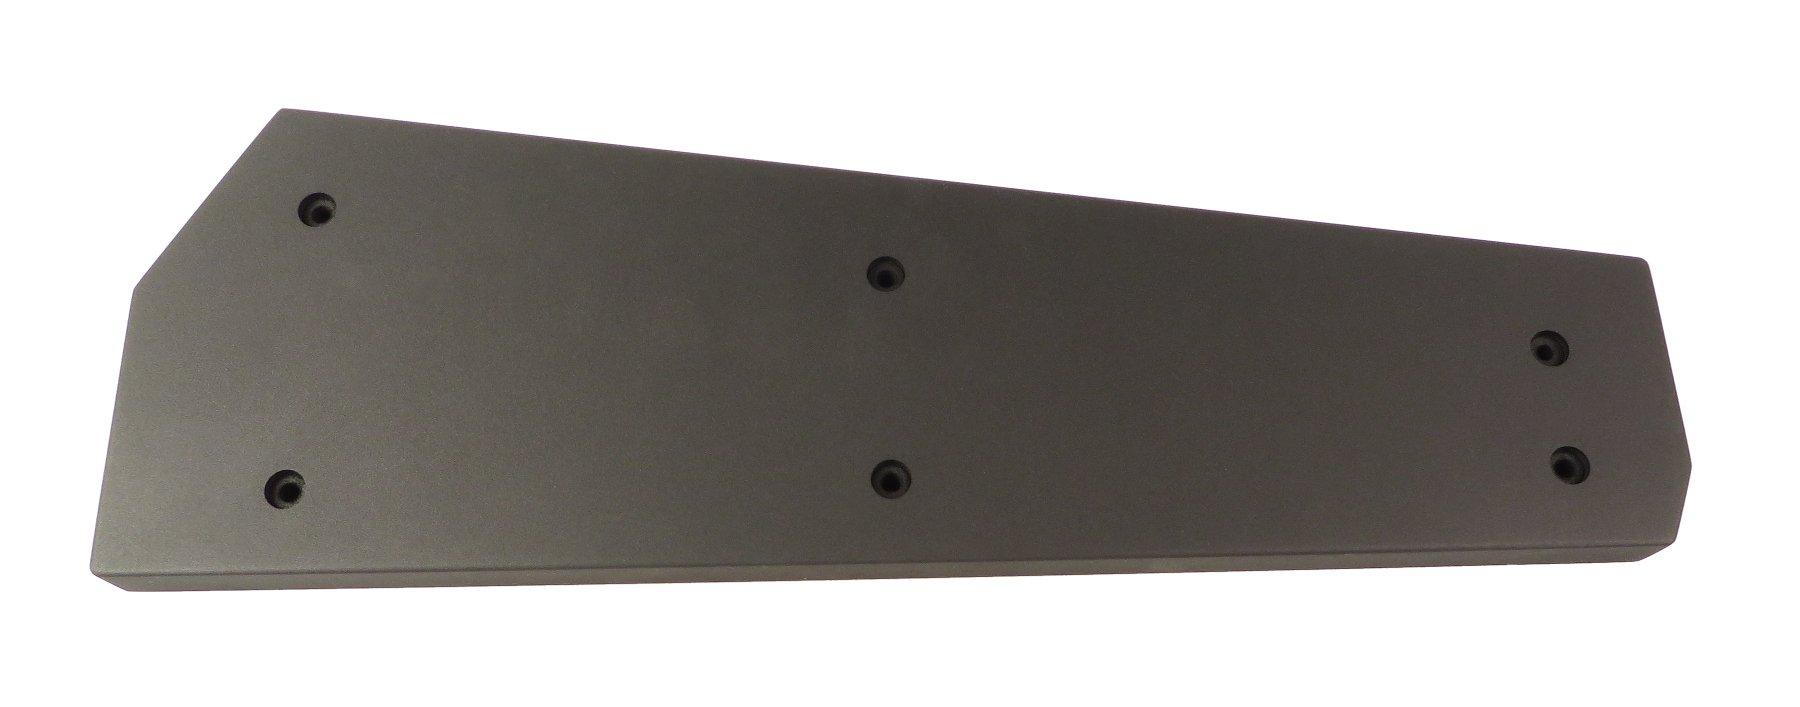 Yamaha WV746600  Left Arm Panel for MOTIF XF8 WV746600